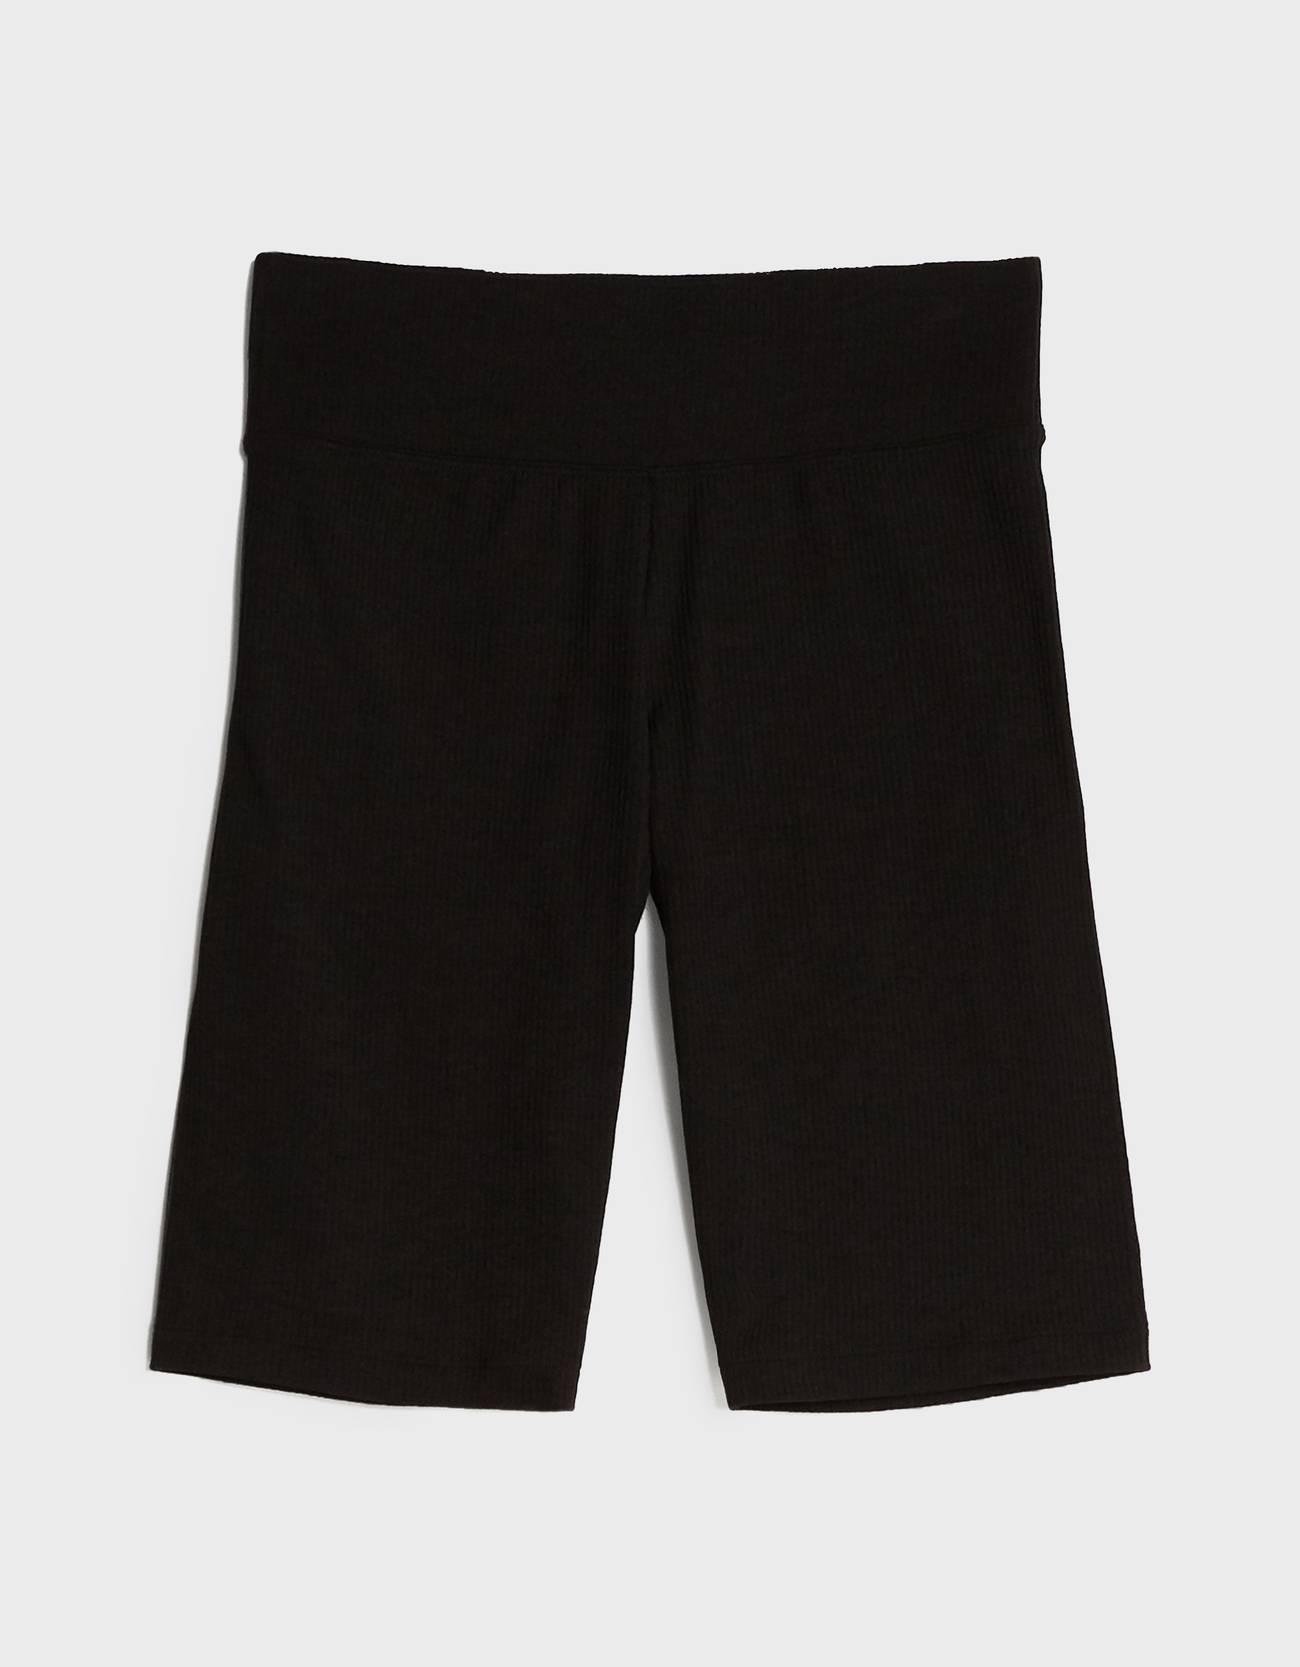 Pantalones ciclistas.